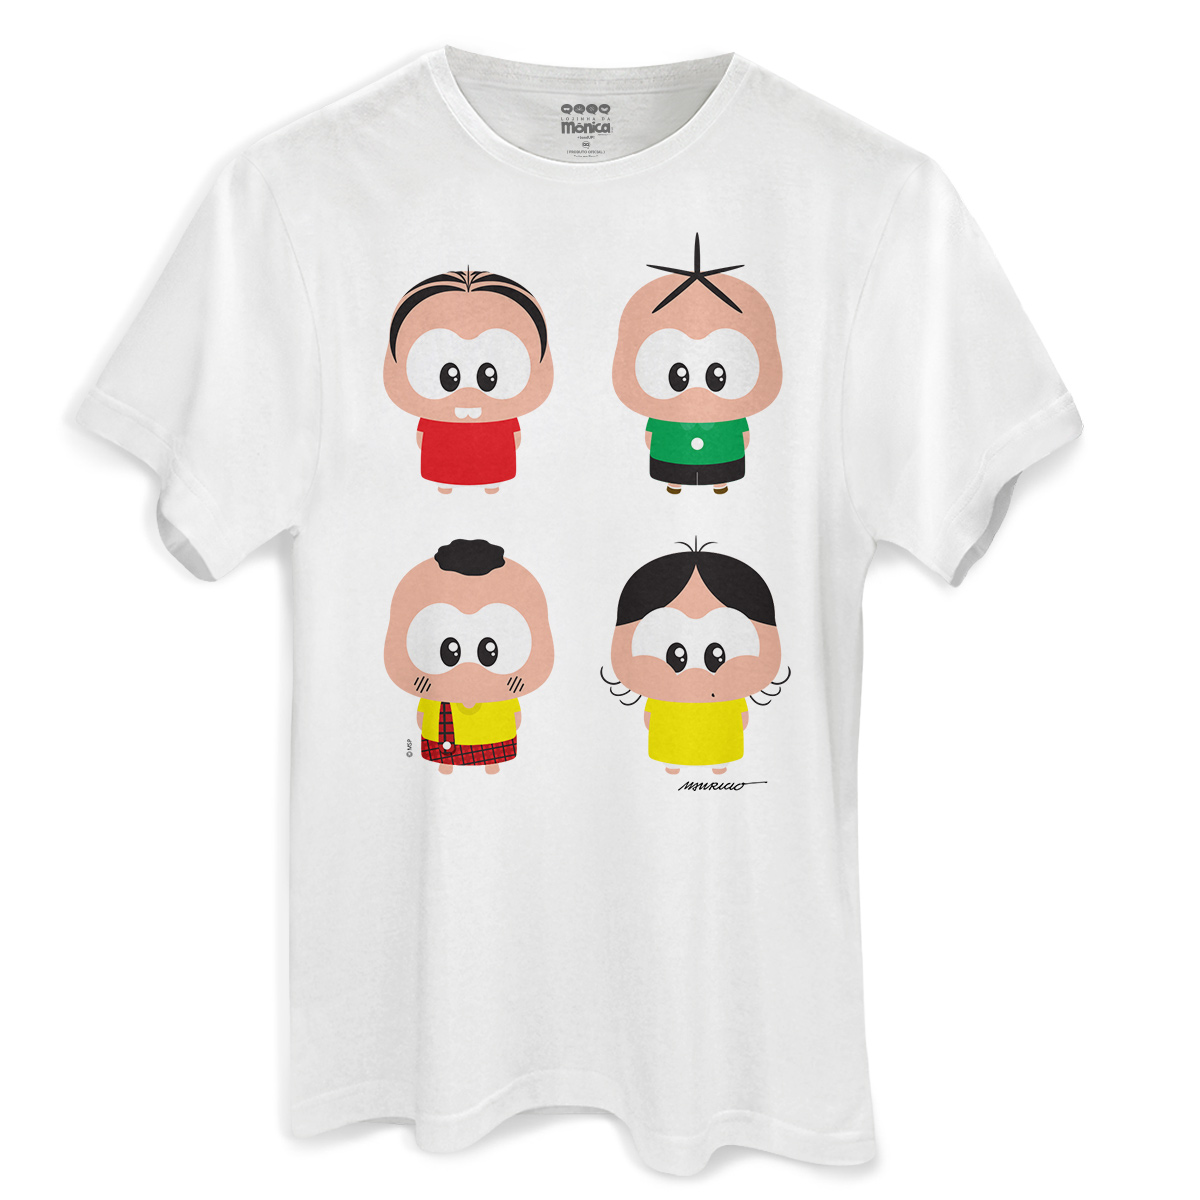 Camiseta Masculina Turma da Mônica A Turma Toy